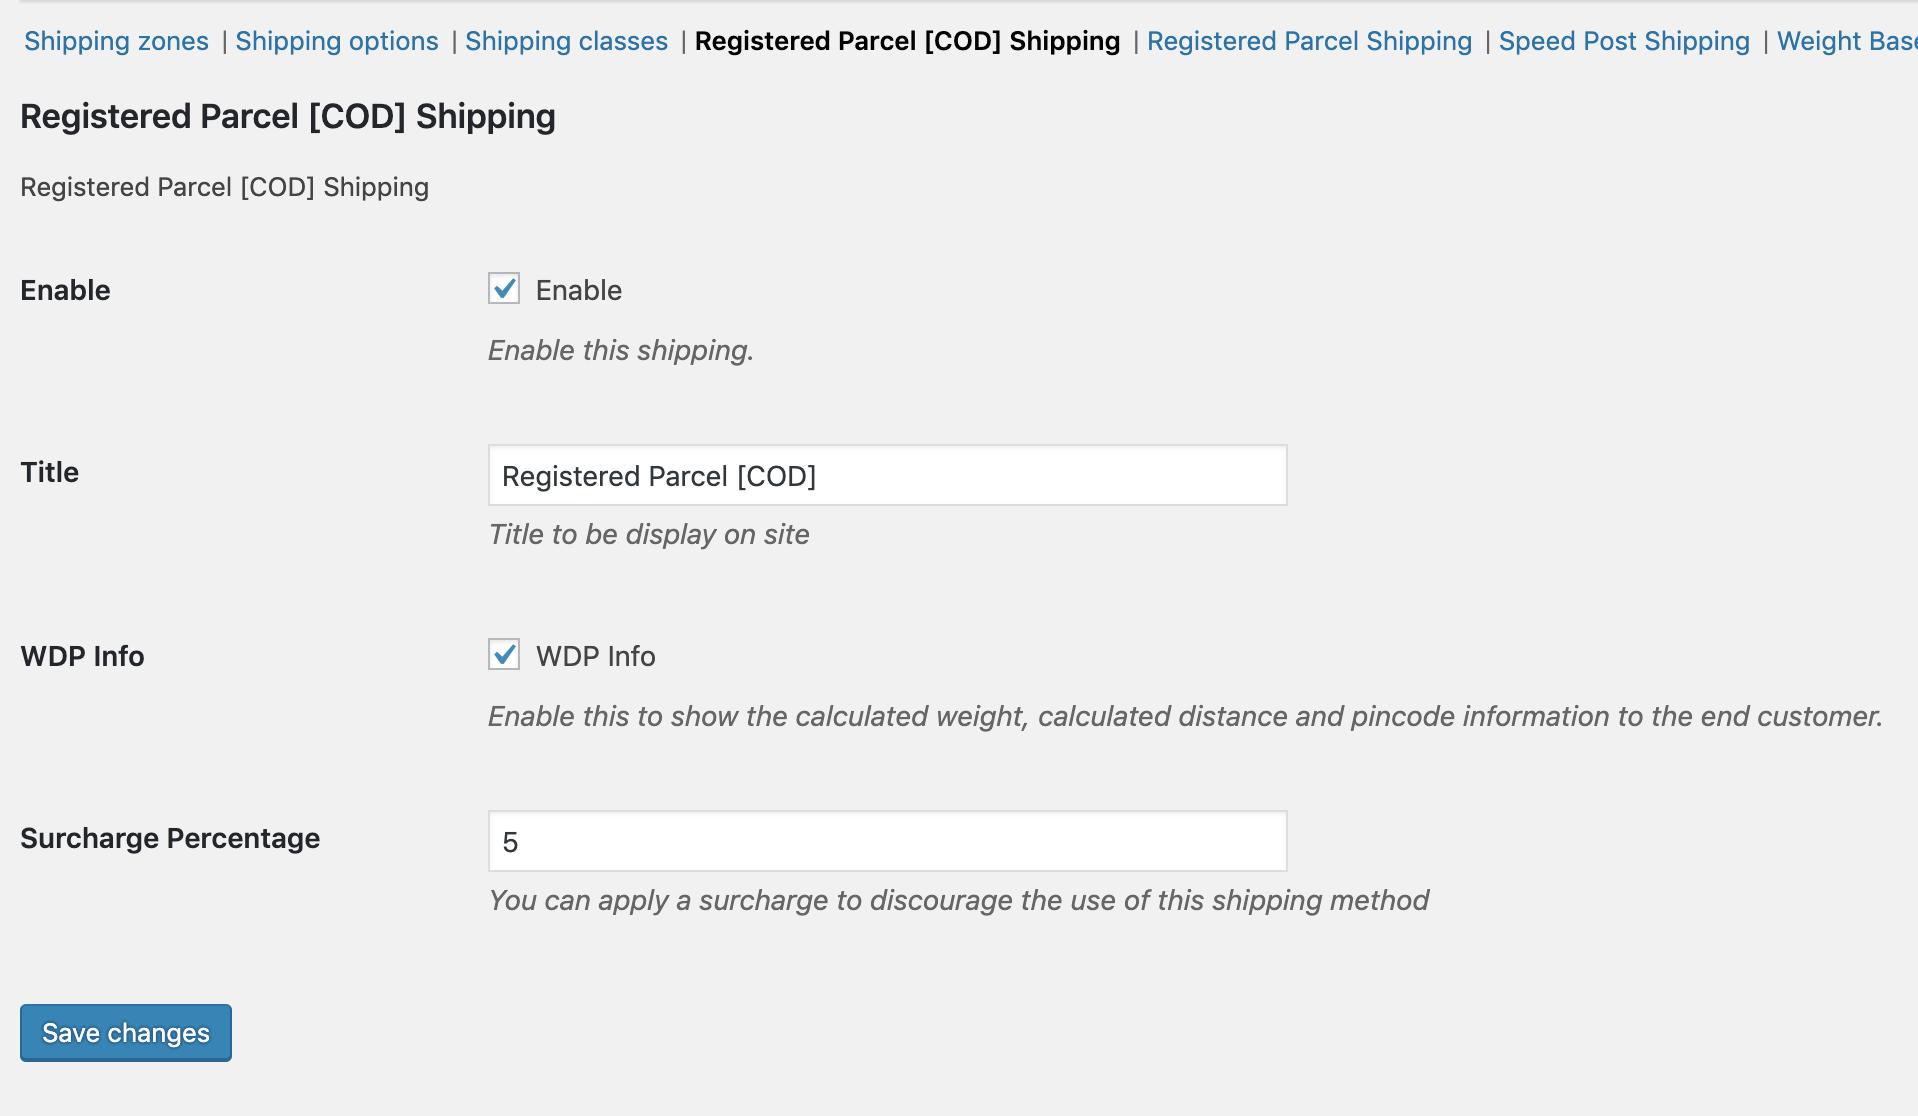 Registered Parcel COD Configurator